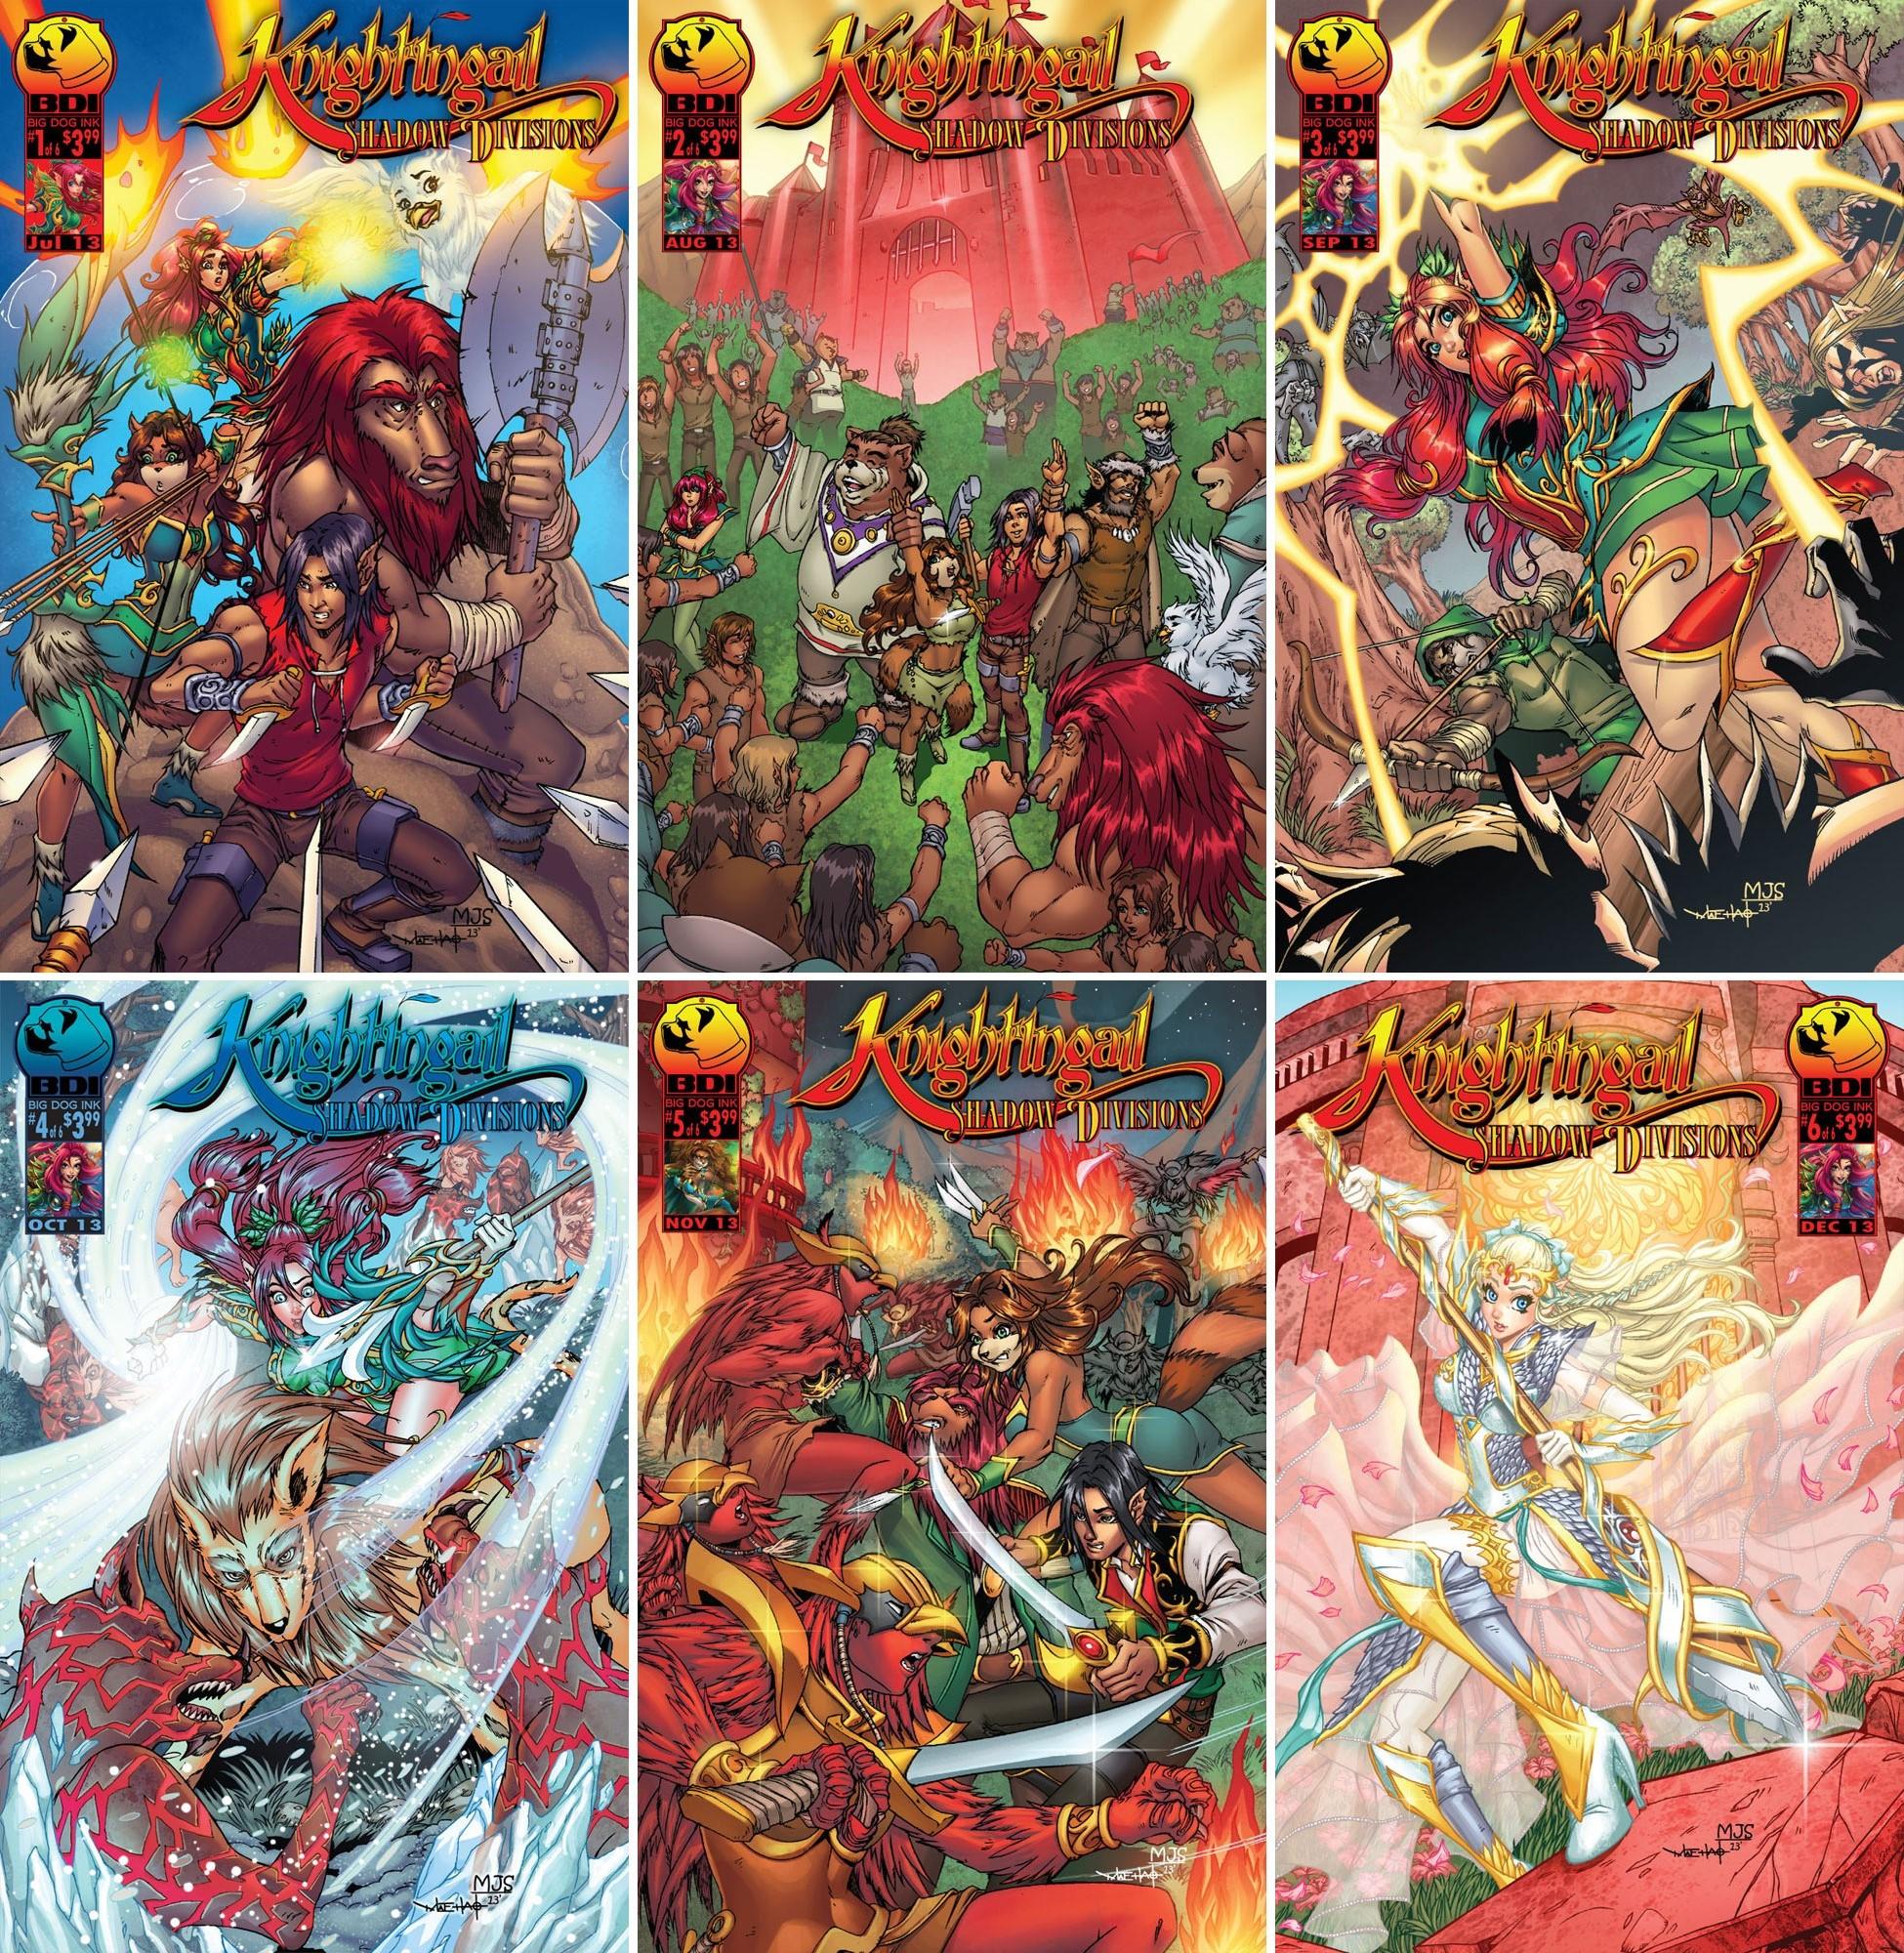 Online comic shops